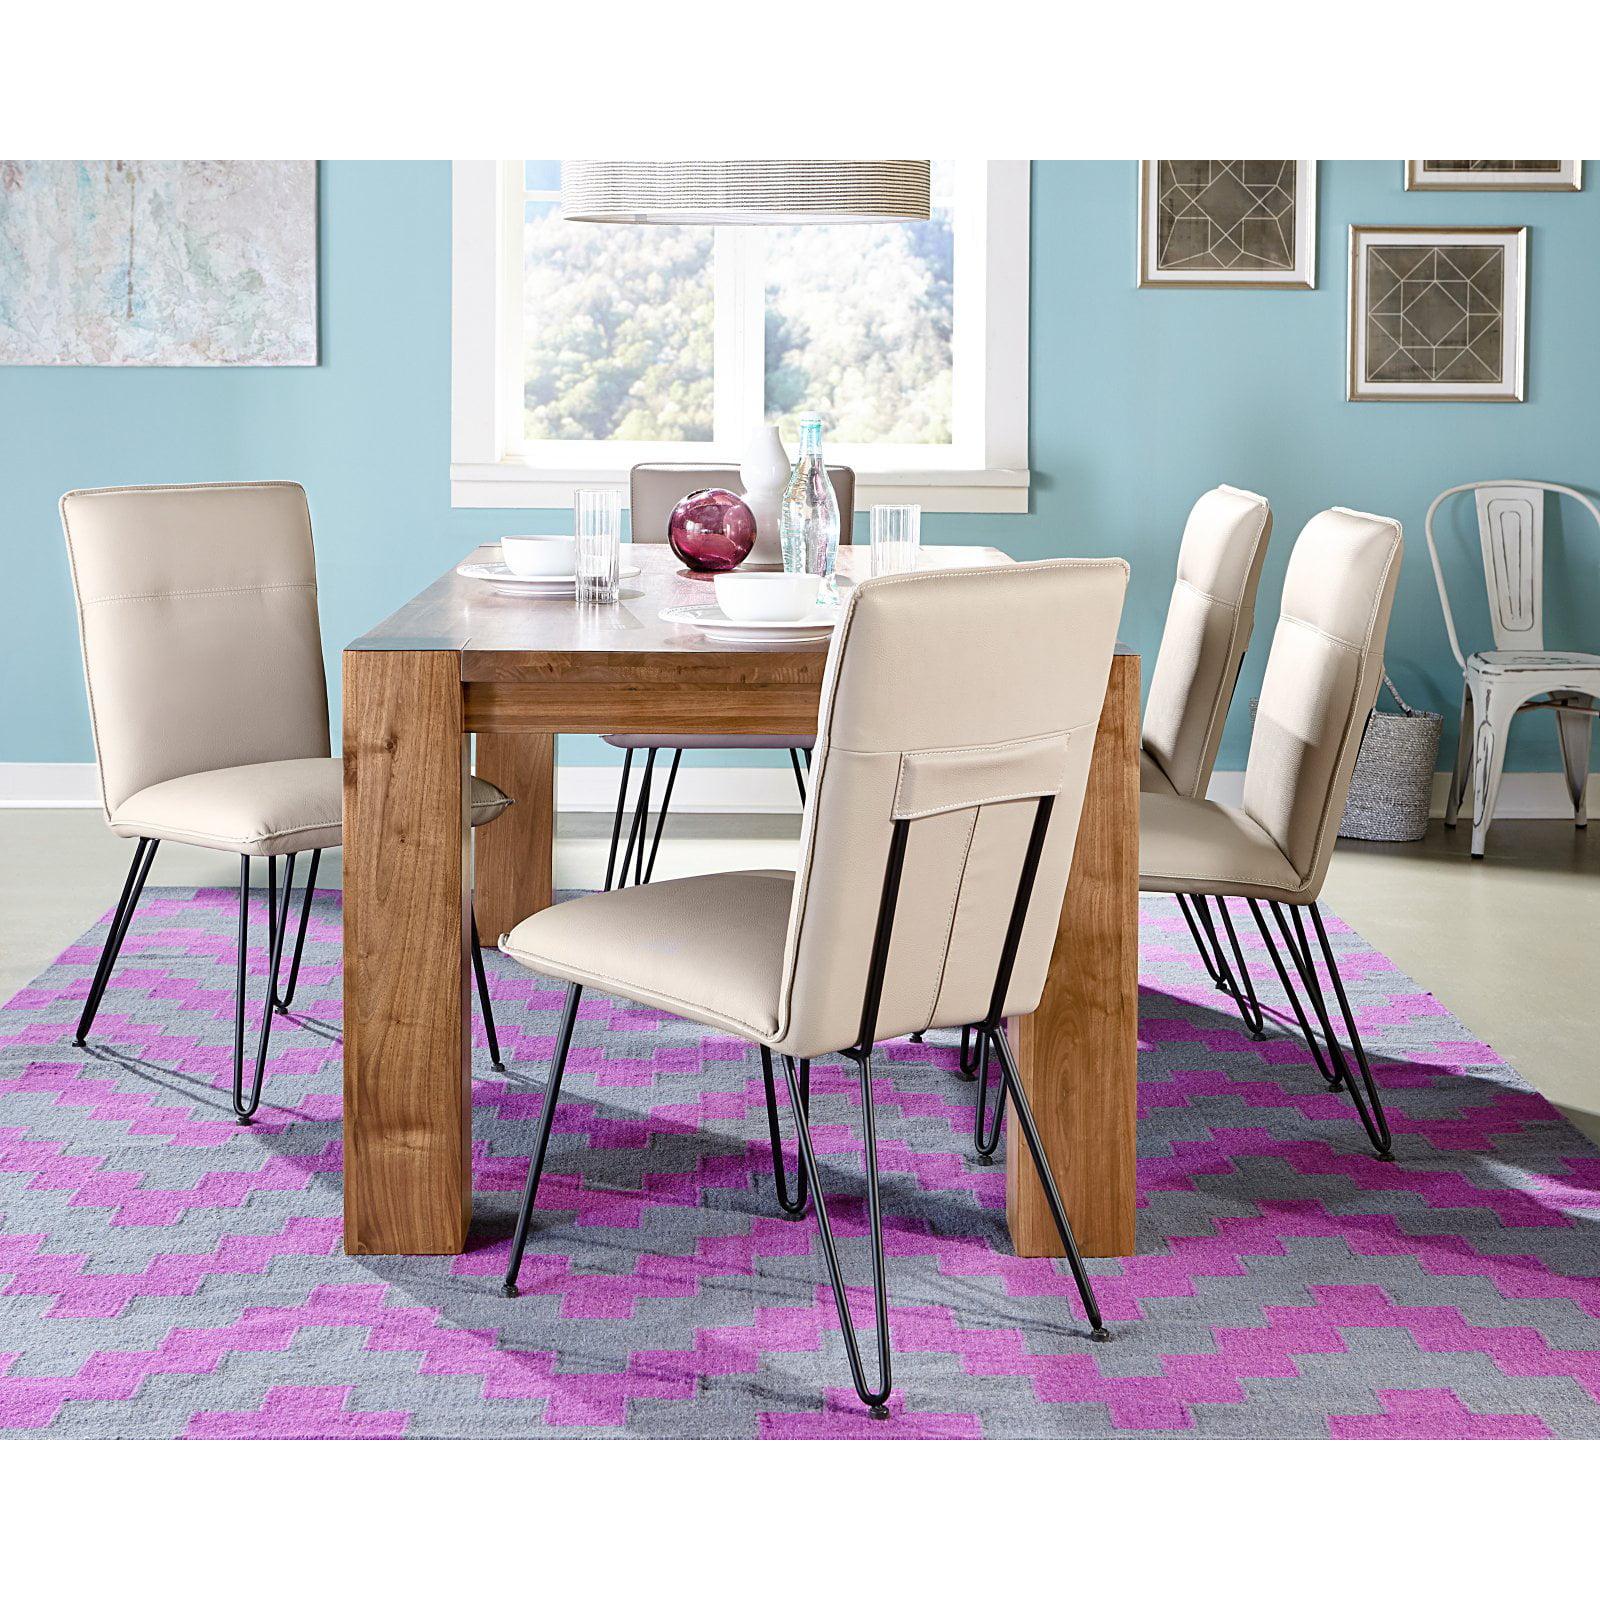 Modus Lassen 79 in. Rectangular Dining Table by Modus Furniture International